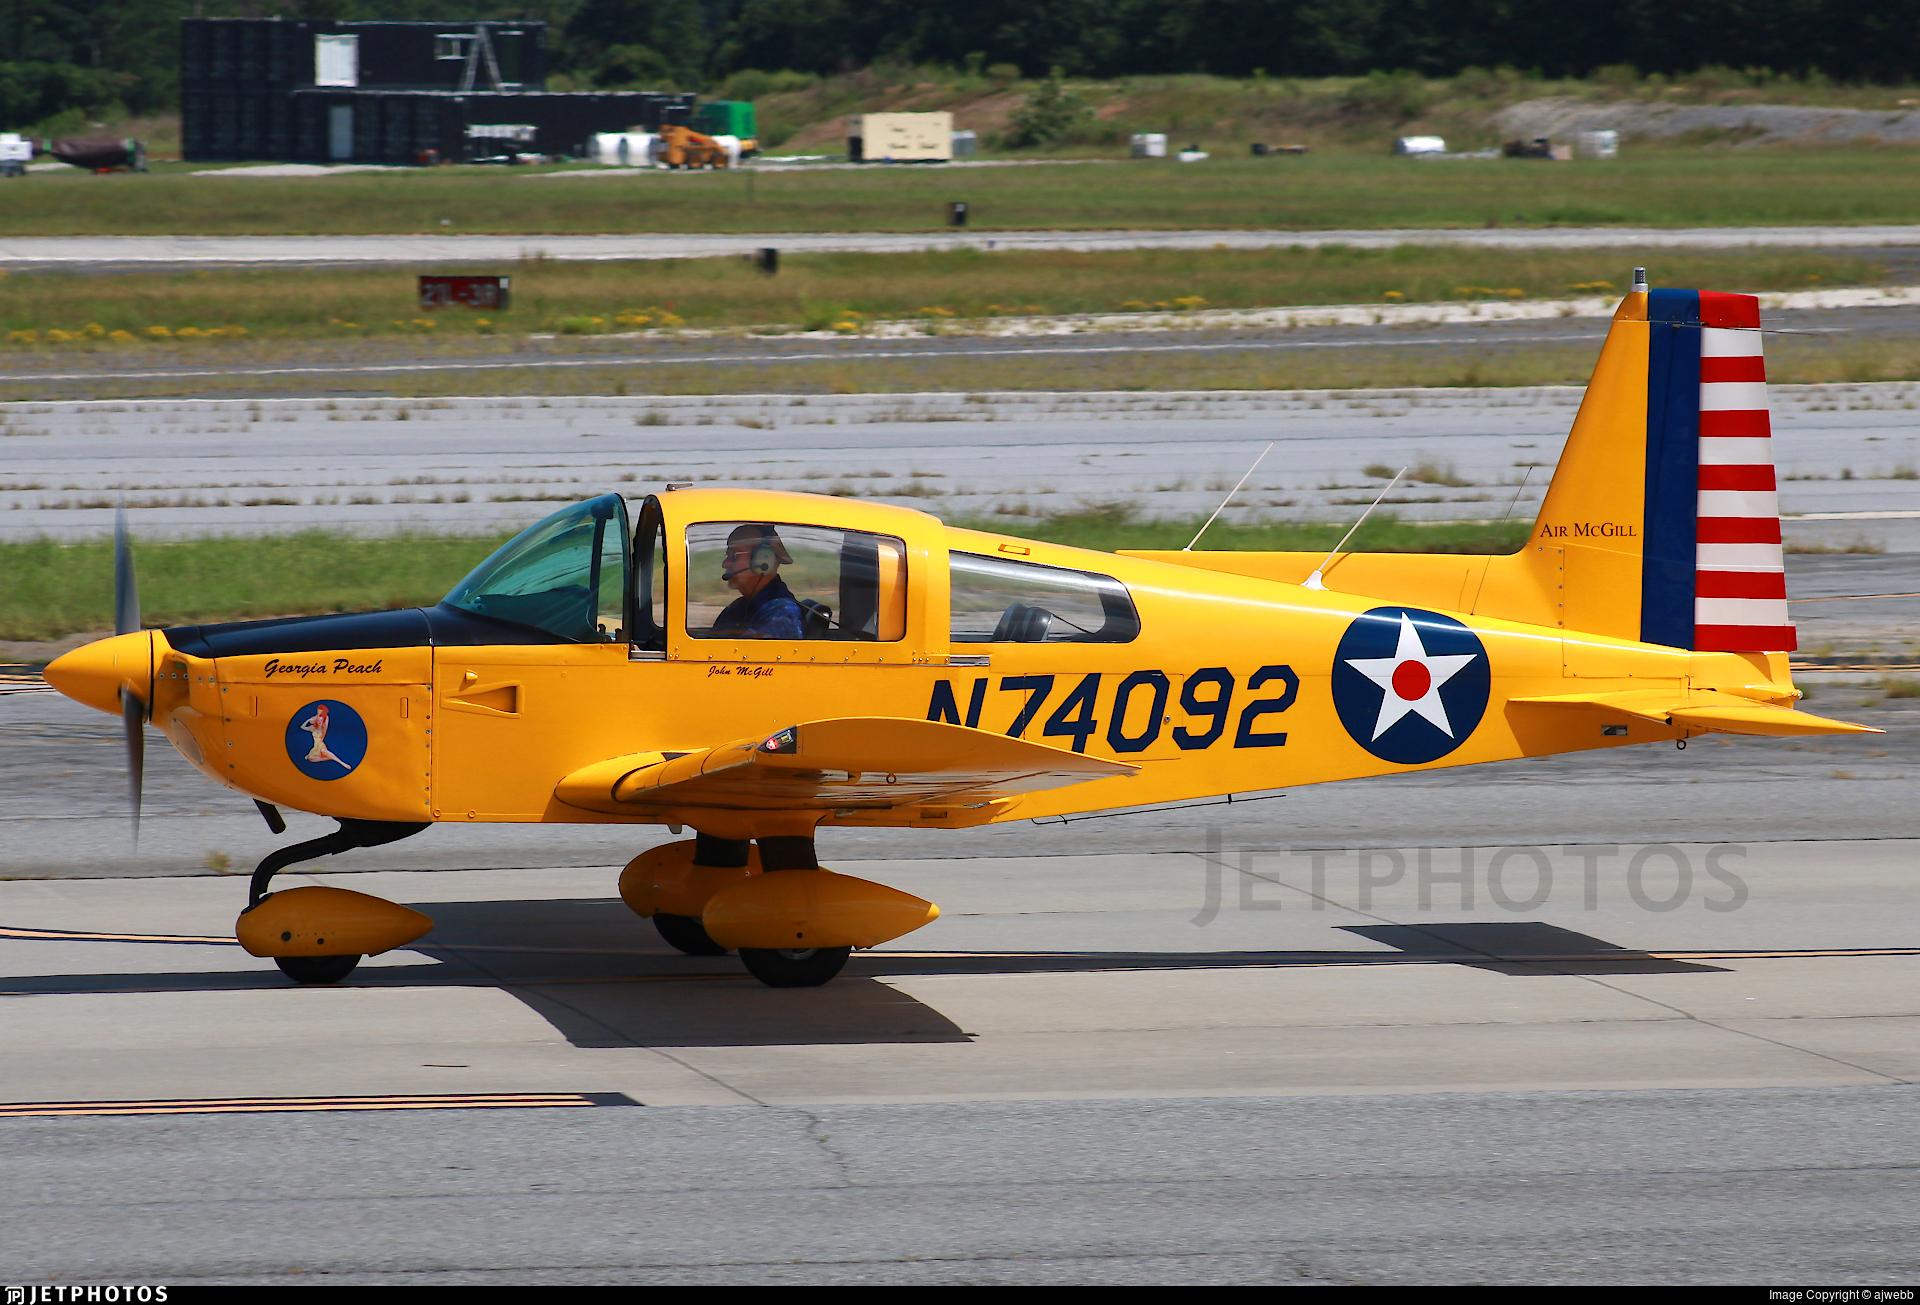 N74092 - Grumman American AA-5B Tiger - Private